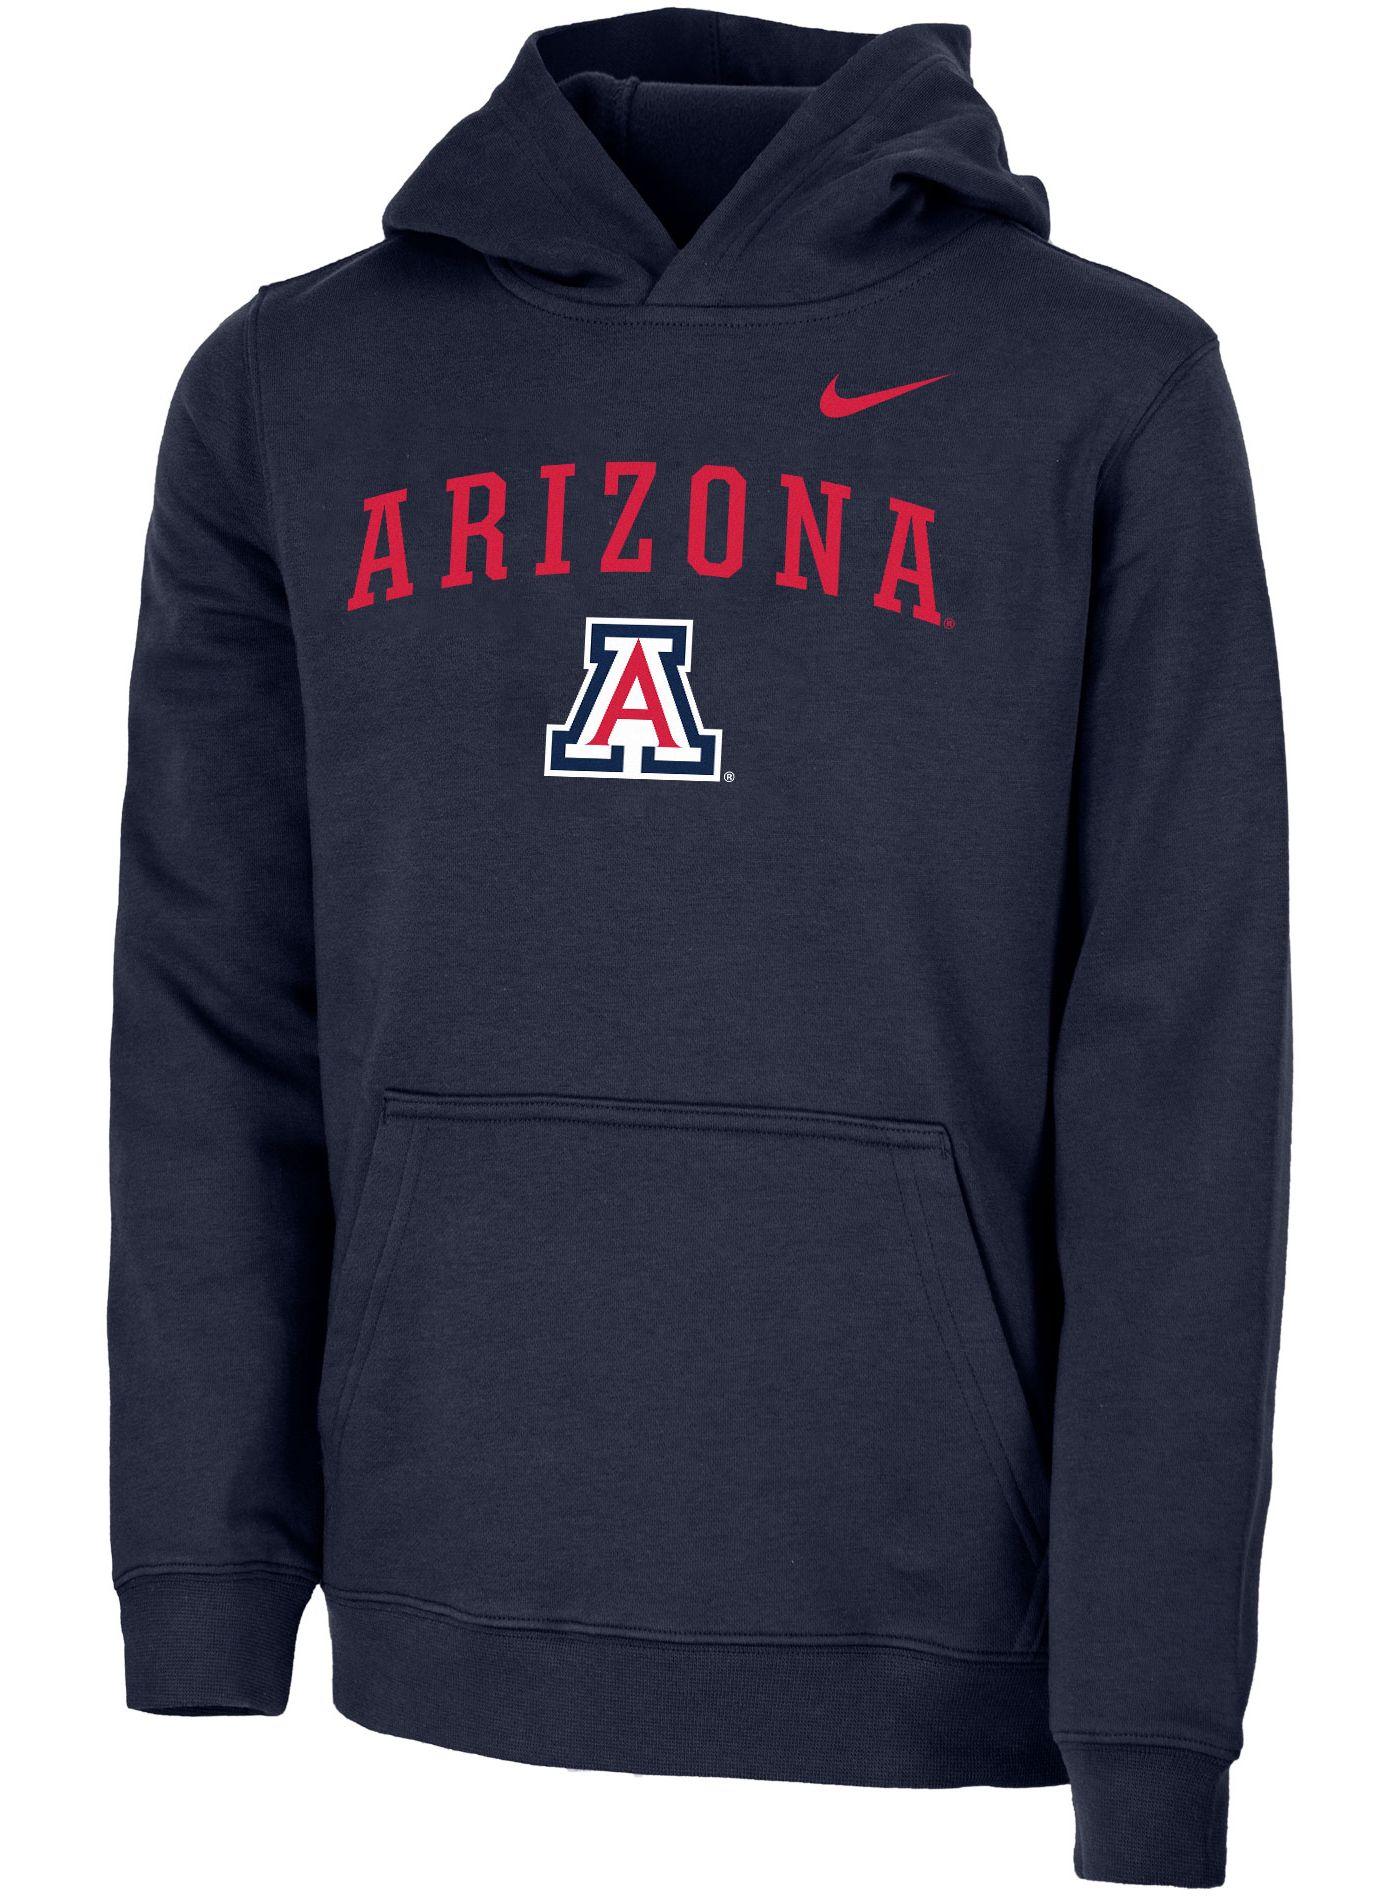 Nike Youth Arizona Wildcats Navy Club Fleece Pullover Hoodie